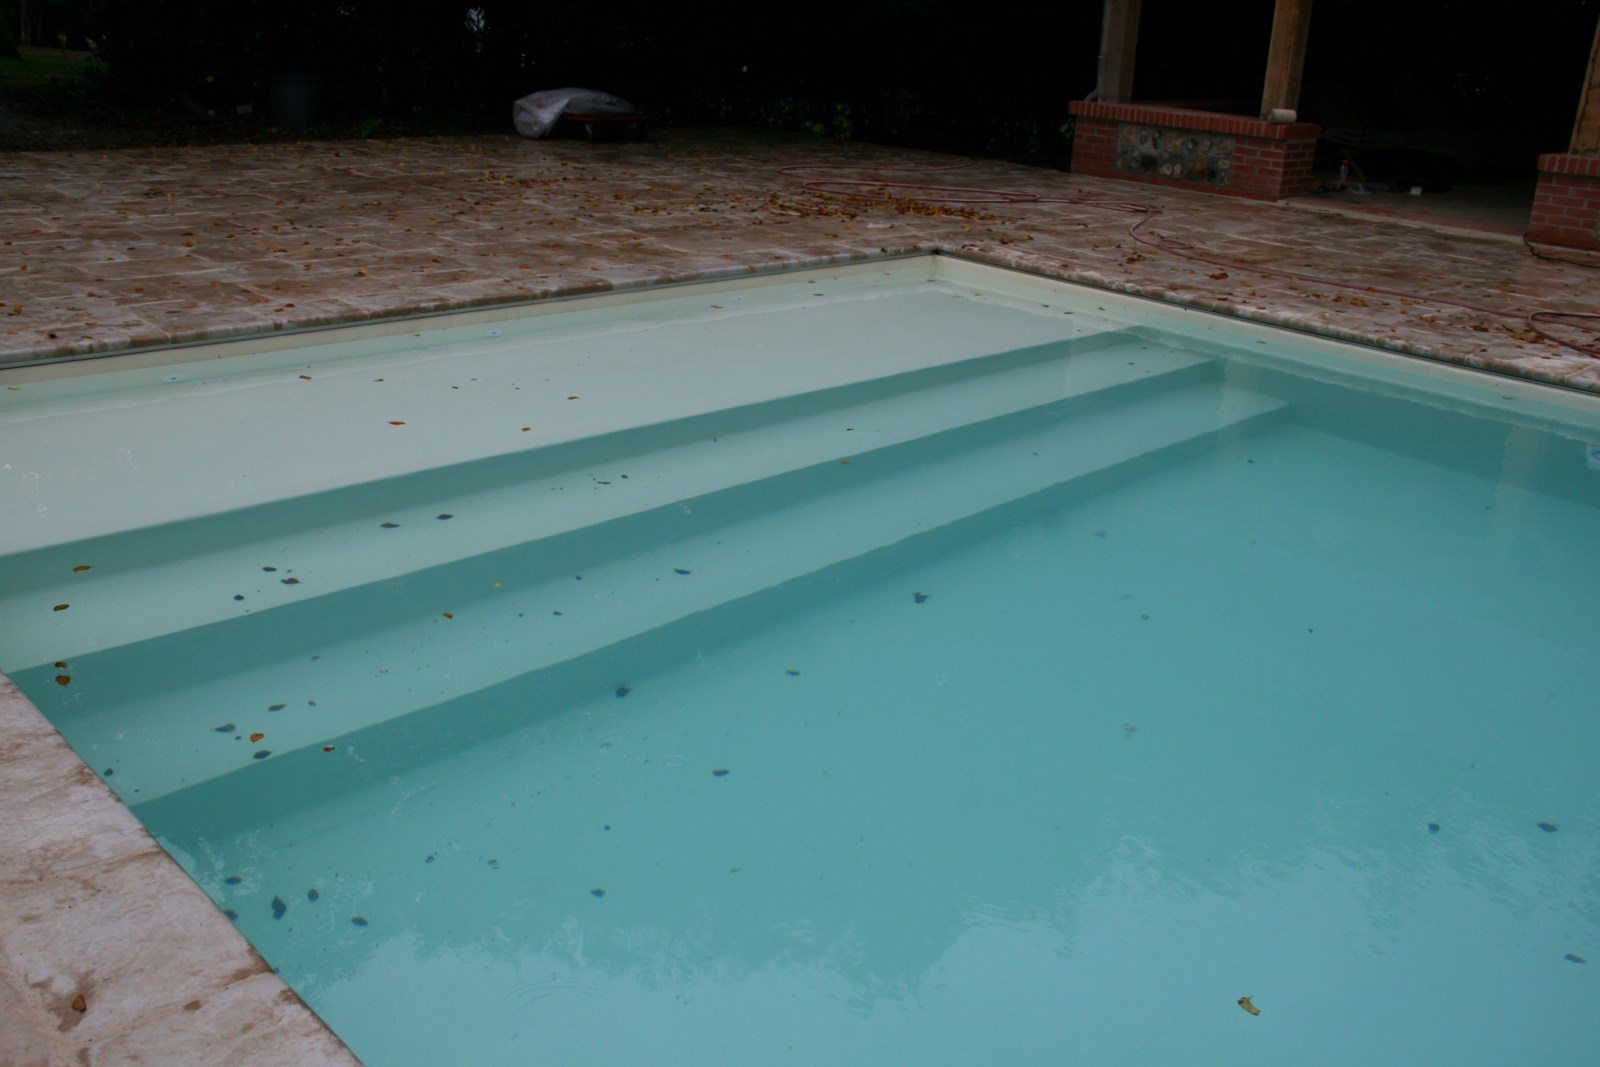 escalier banquette piscine cb18 jornalagora. Black Bedroom Furniture Sets. Home Design Ideas